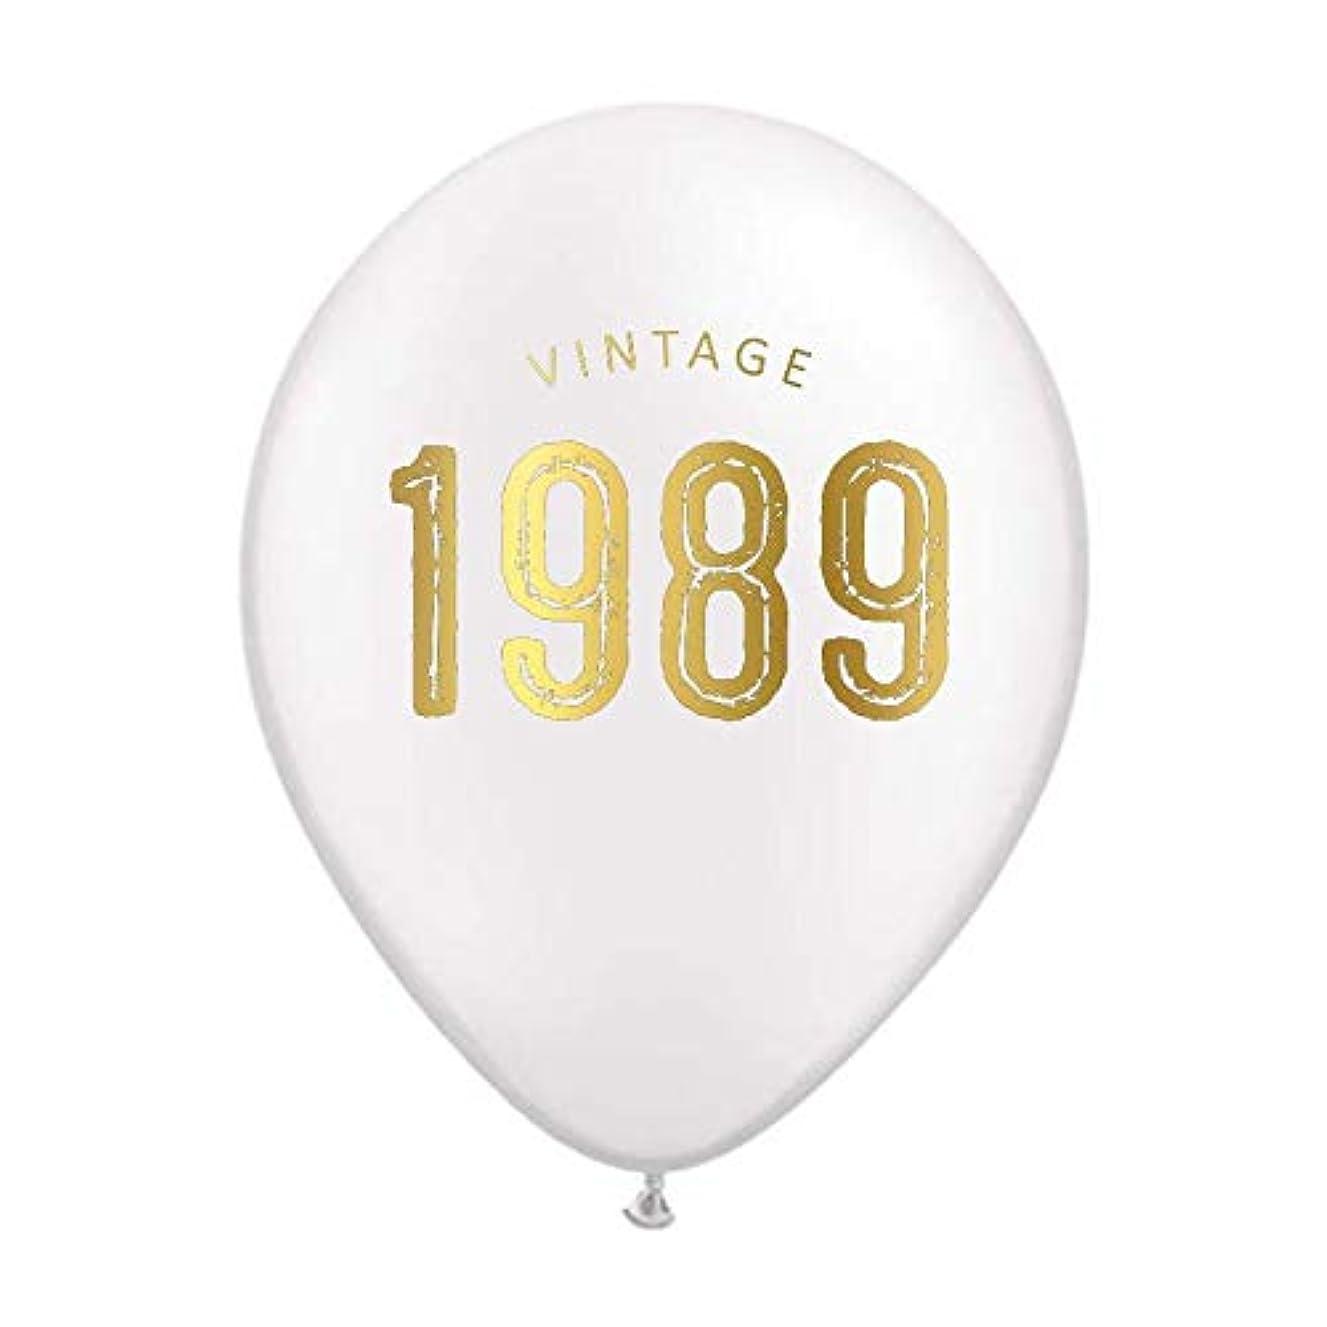 White Vintage 1989 30th Birthday Party Balloons, 30th Birthday Party Decor Decorations, Funny Gag Balloons for 30th Birthday, Vintage 1989, Set of 3, Gag Gift for 30th Birthday